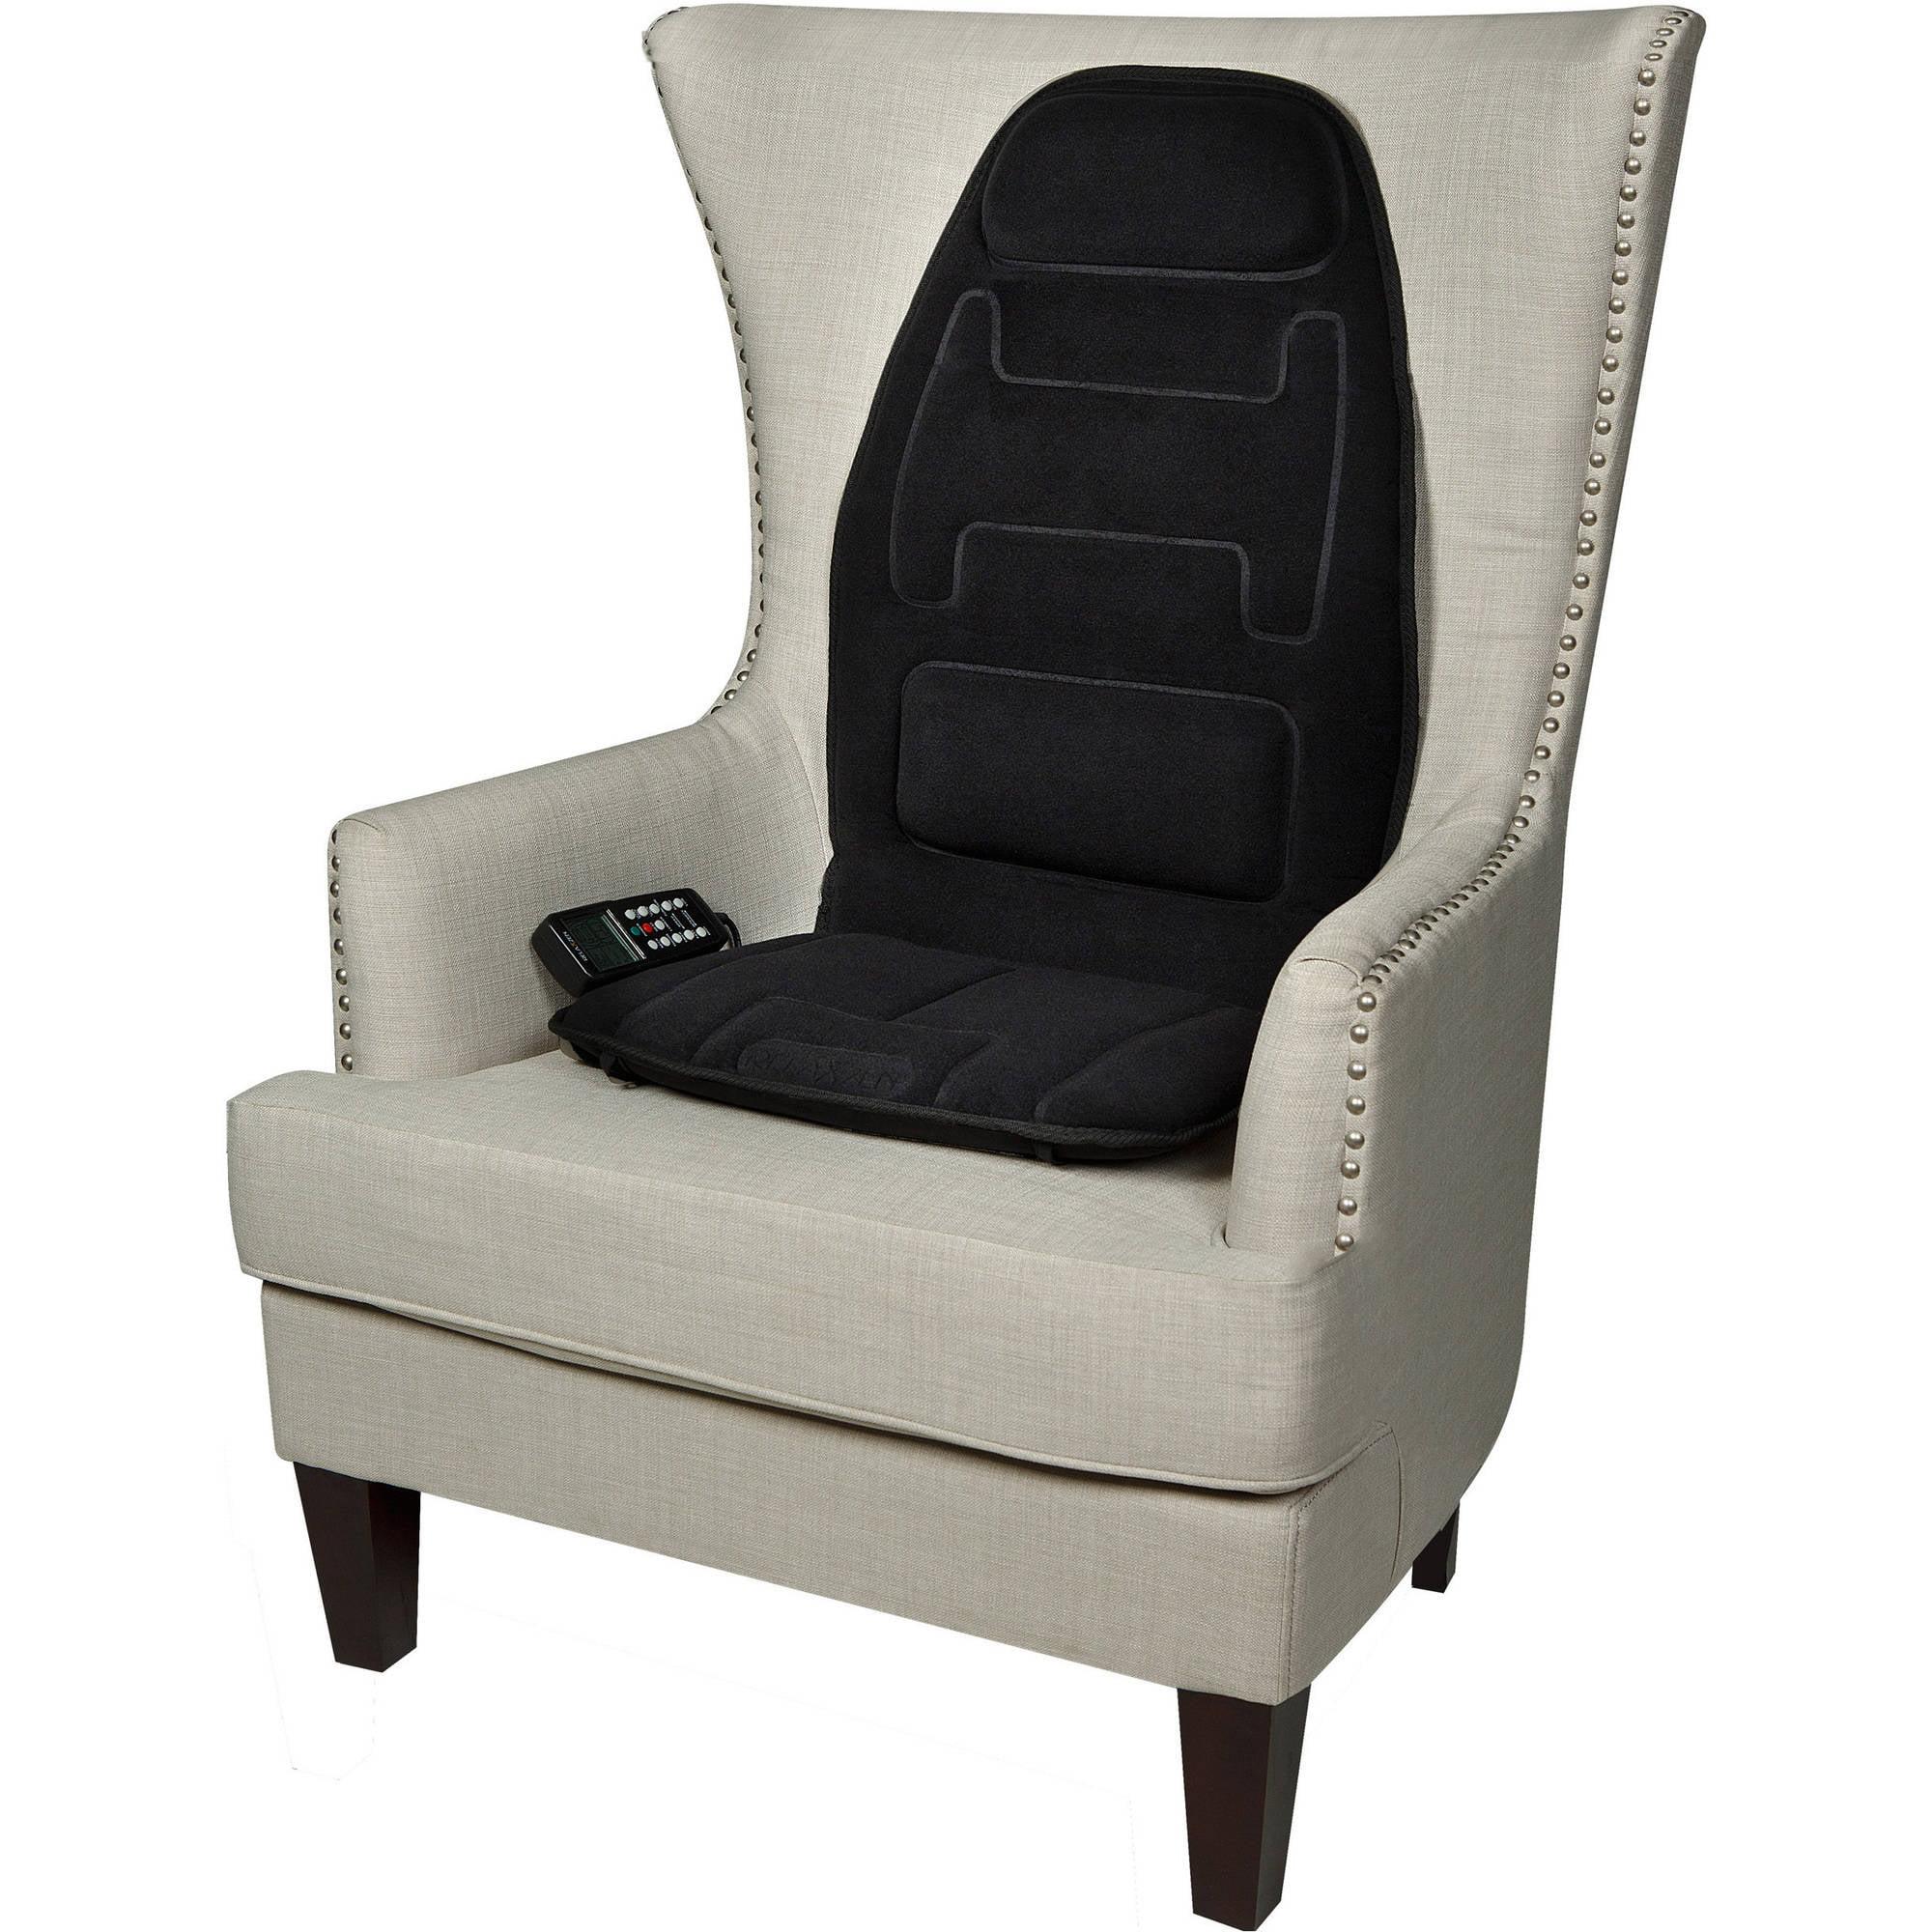 Relaxzen 60 2910P Massage Seat Cushion Black Walmart